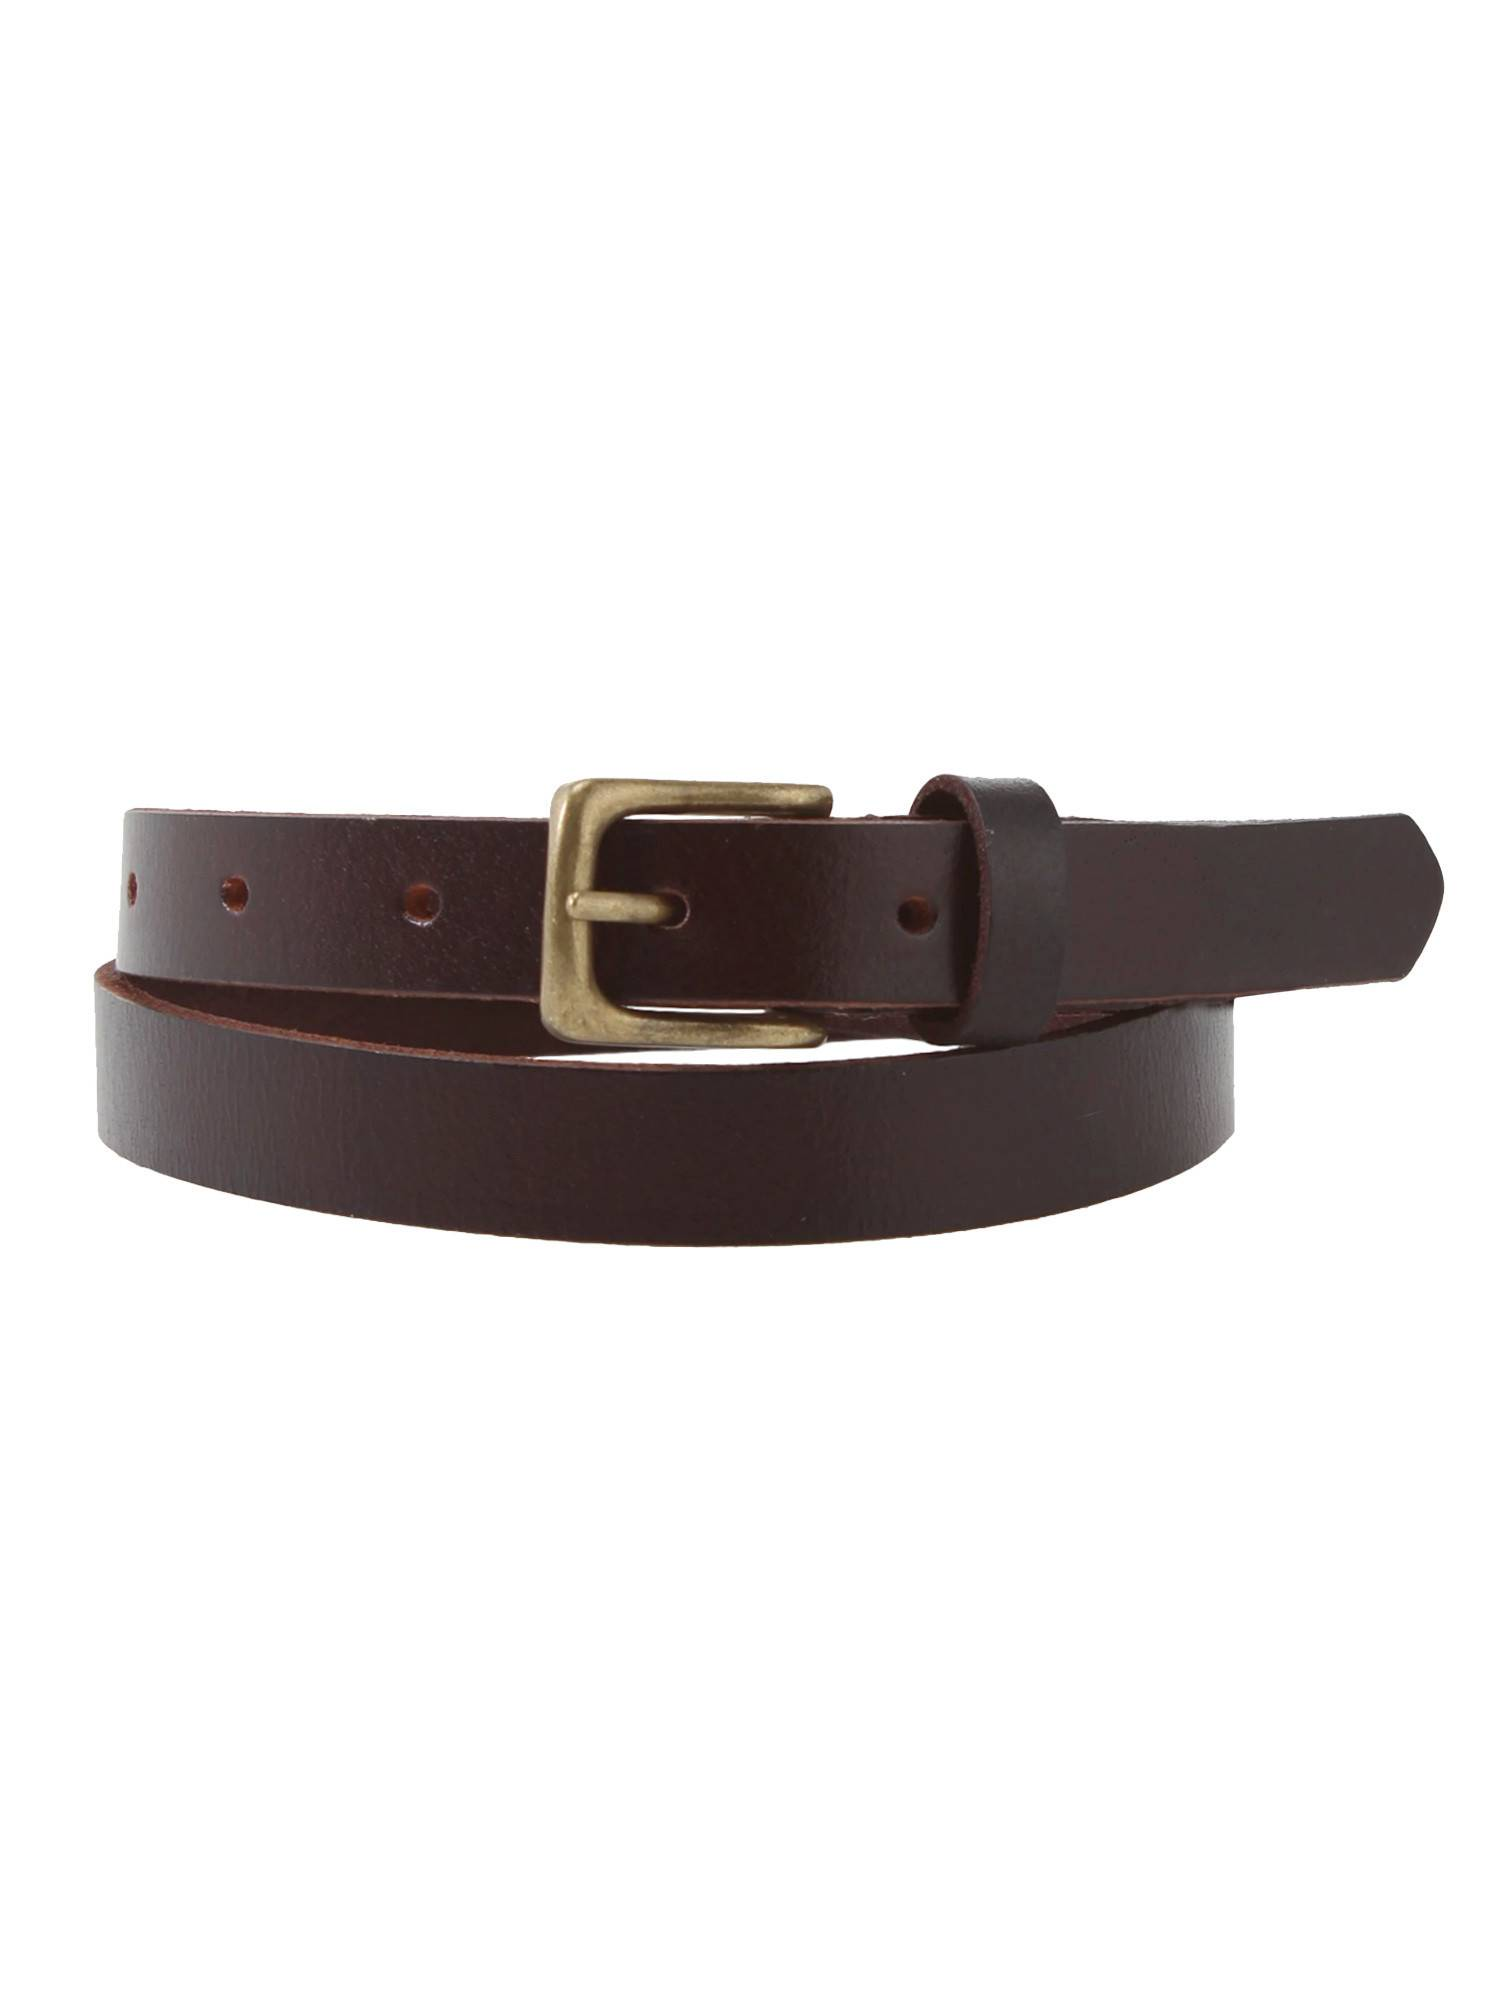 vintage slim belt